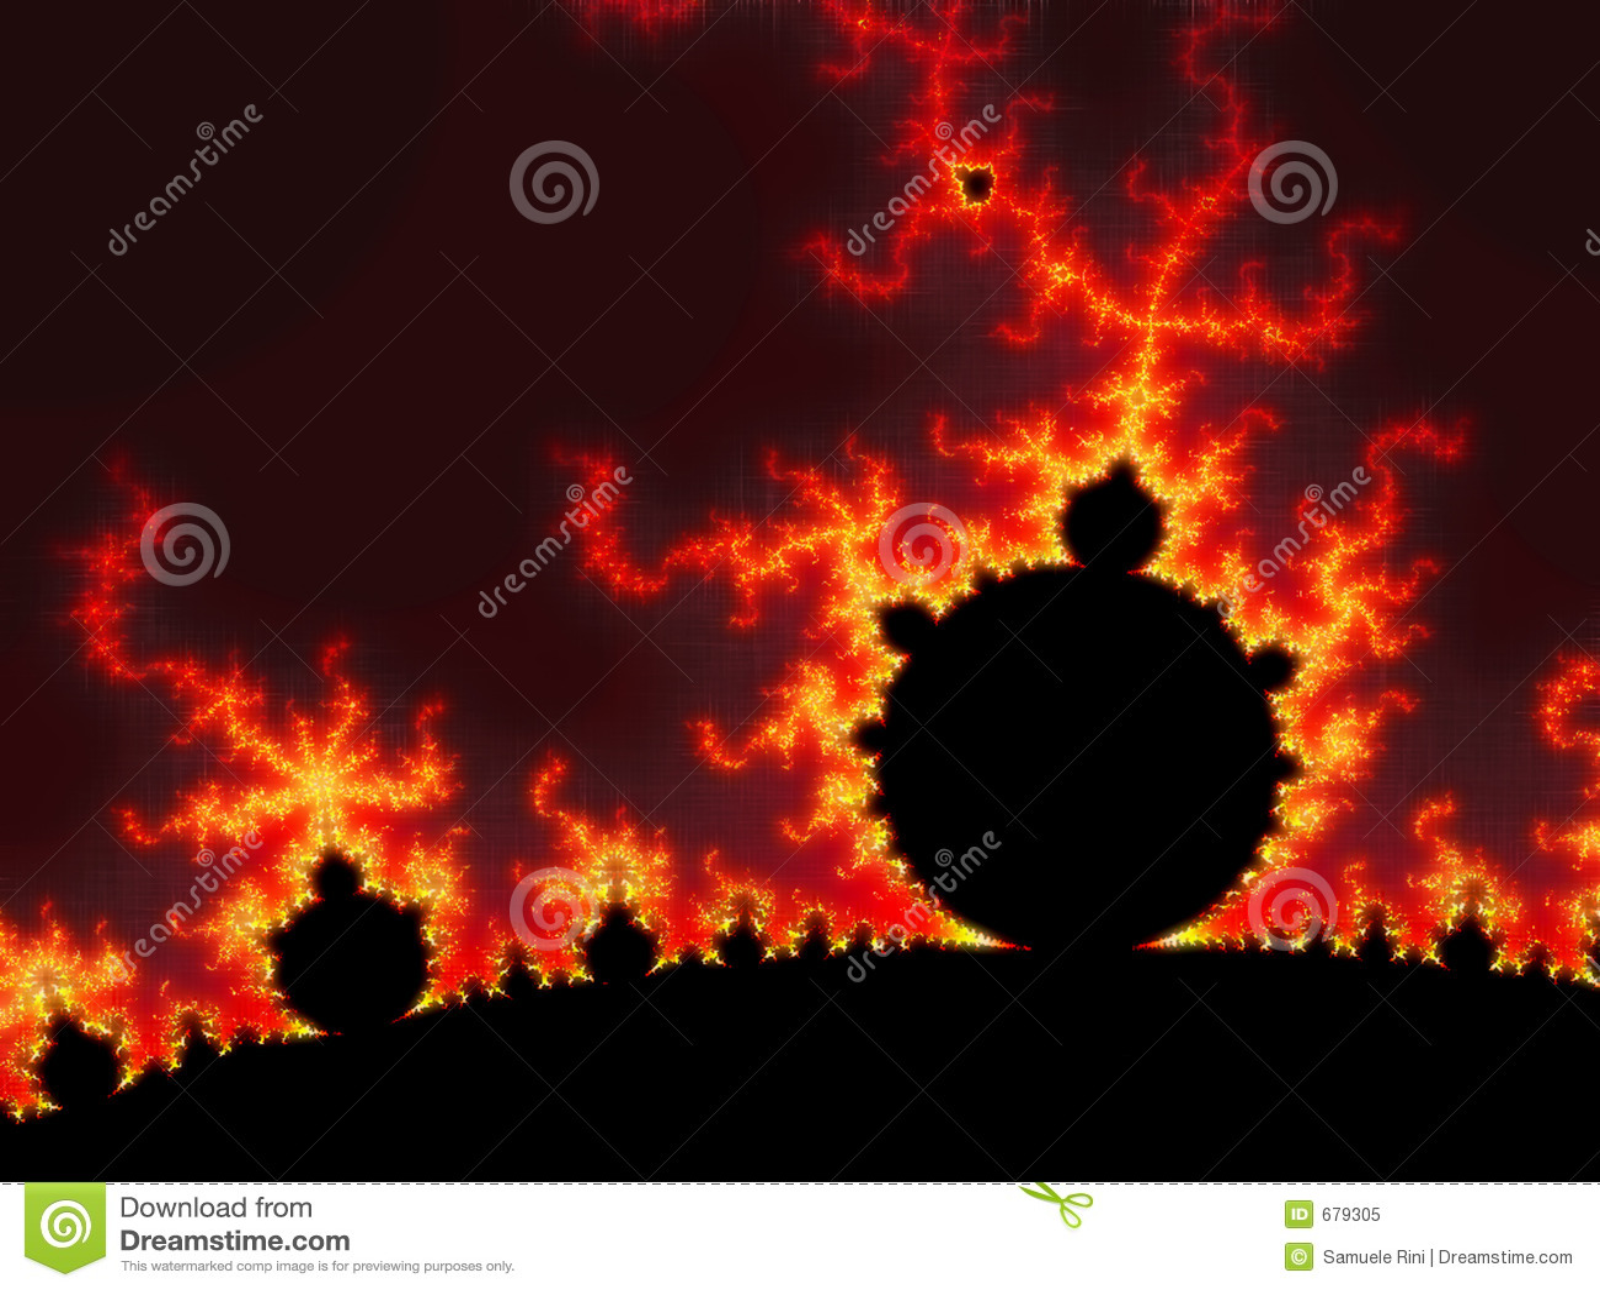 Sun fractal